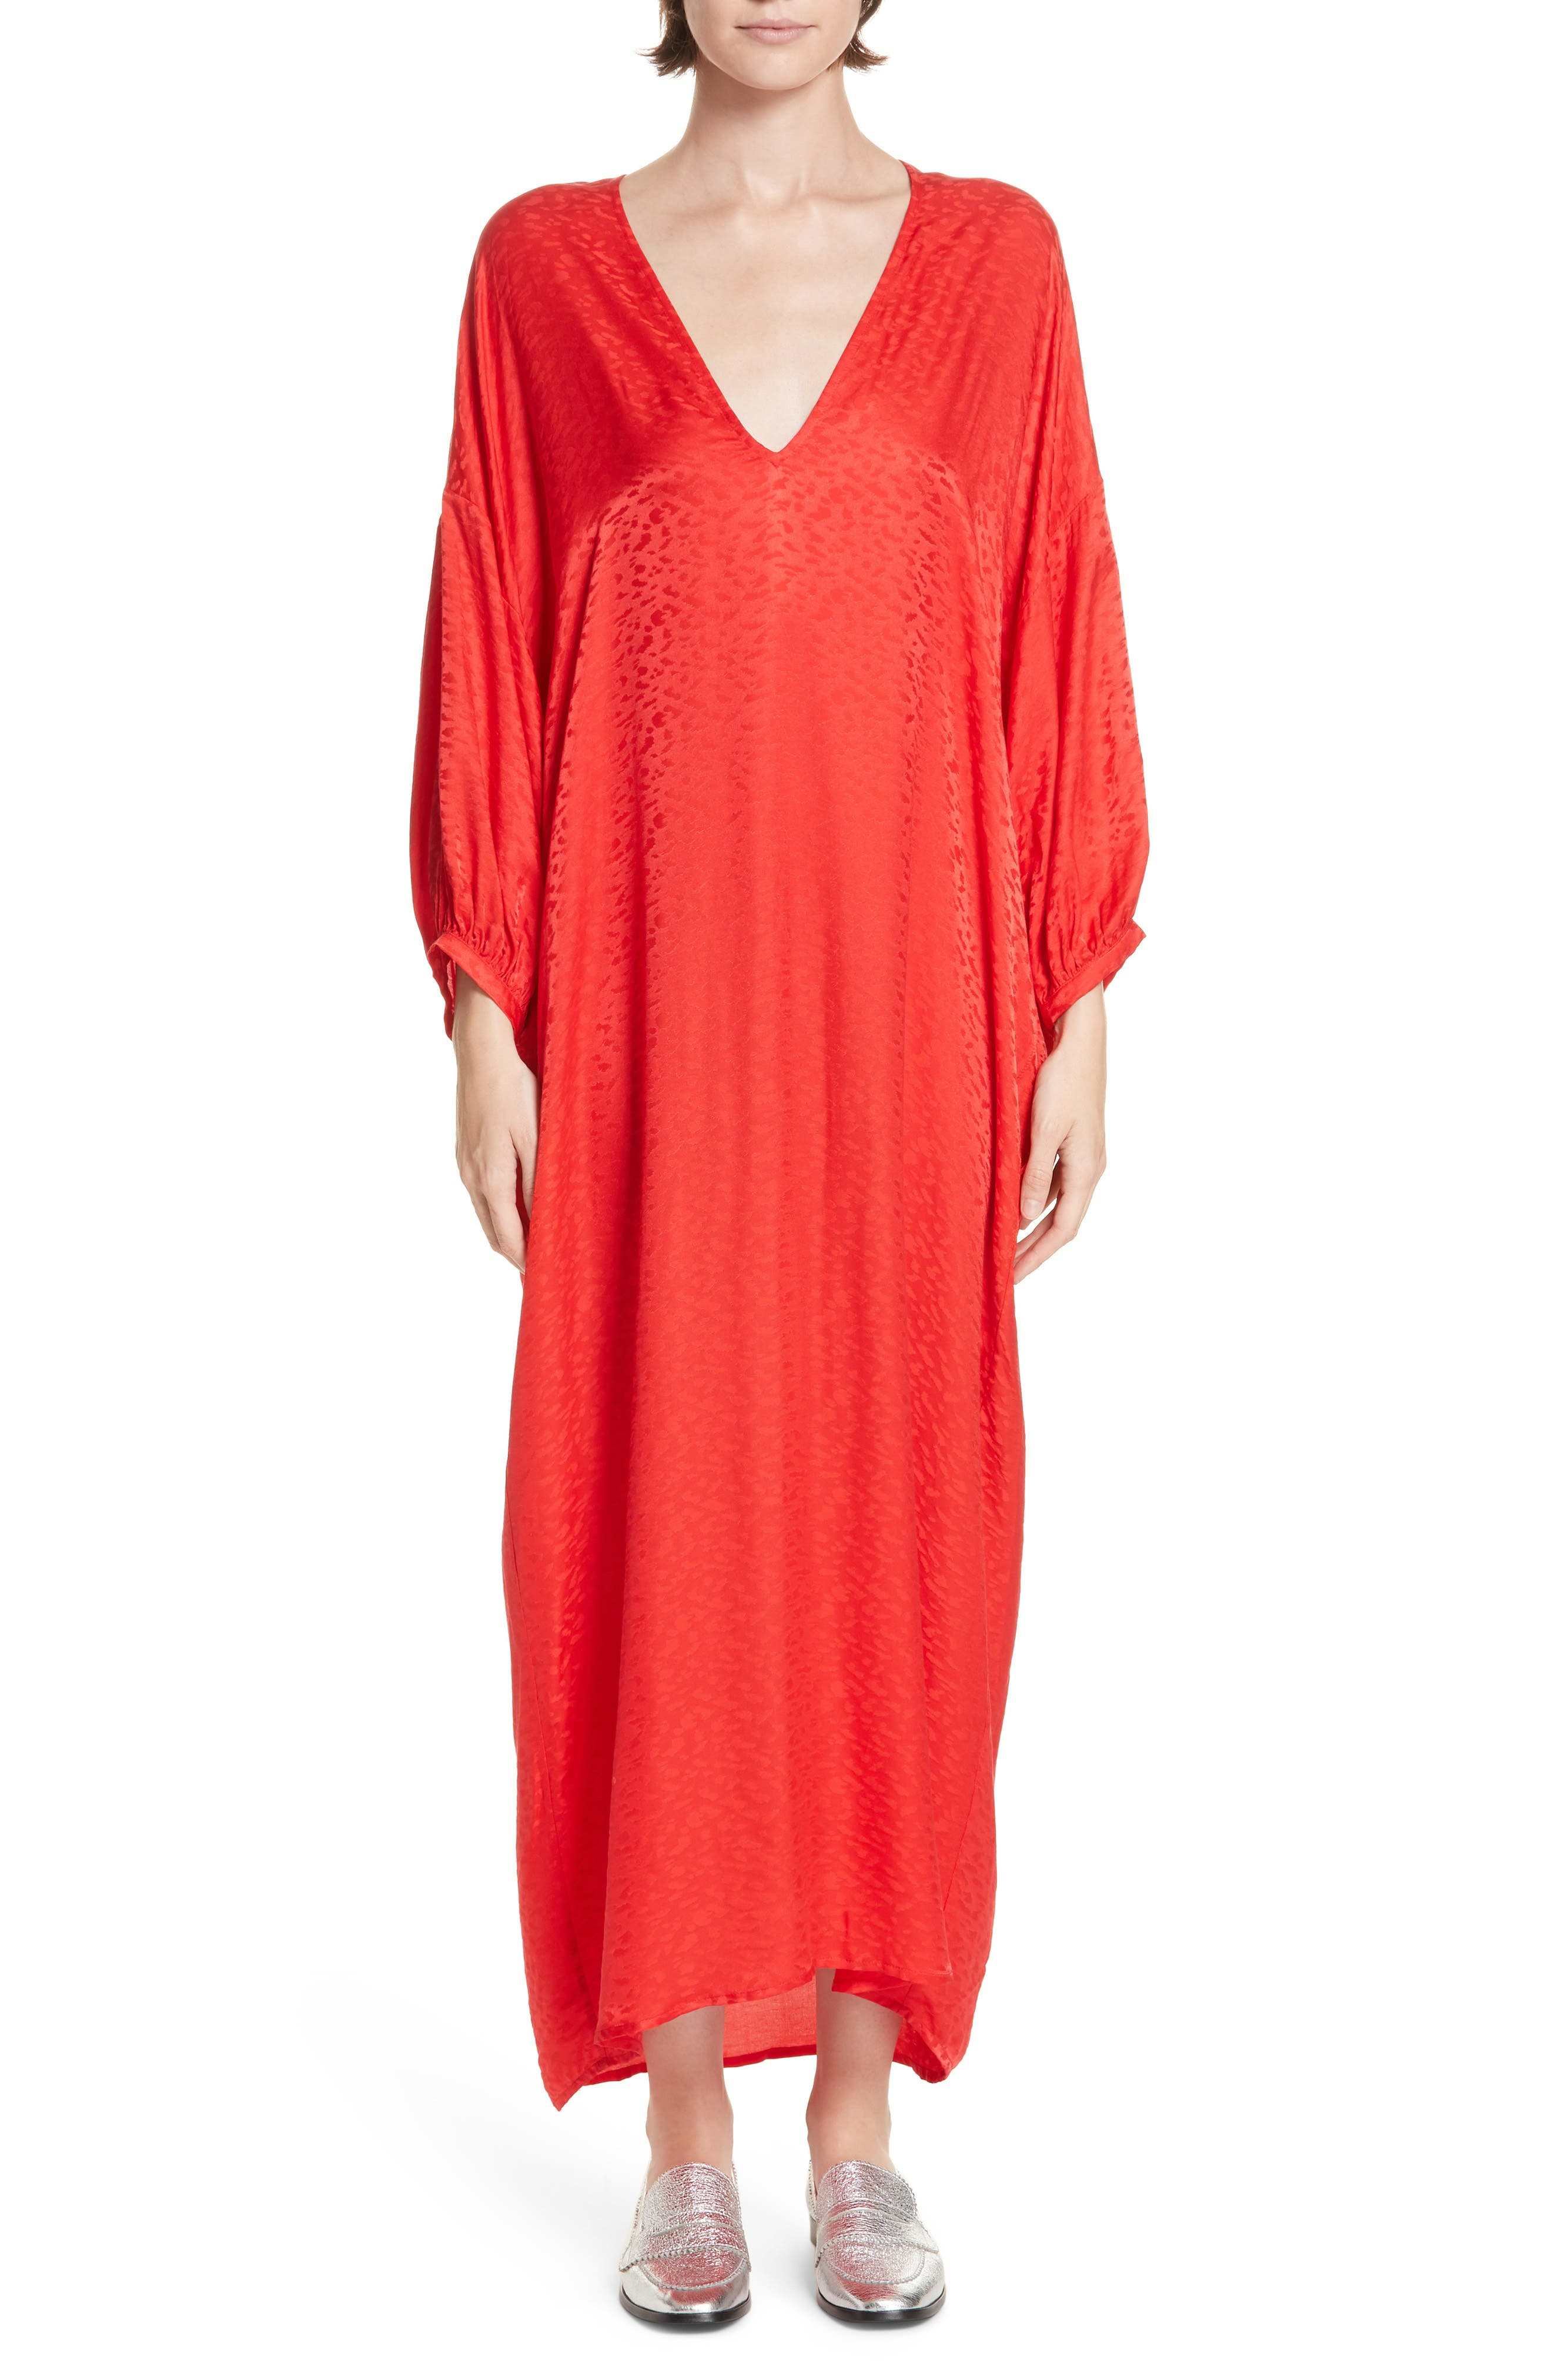 ROSEANNA Season Jacquard Maxi Dress in Rouge